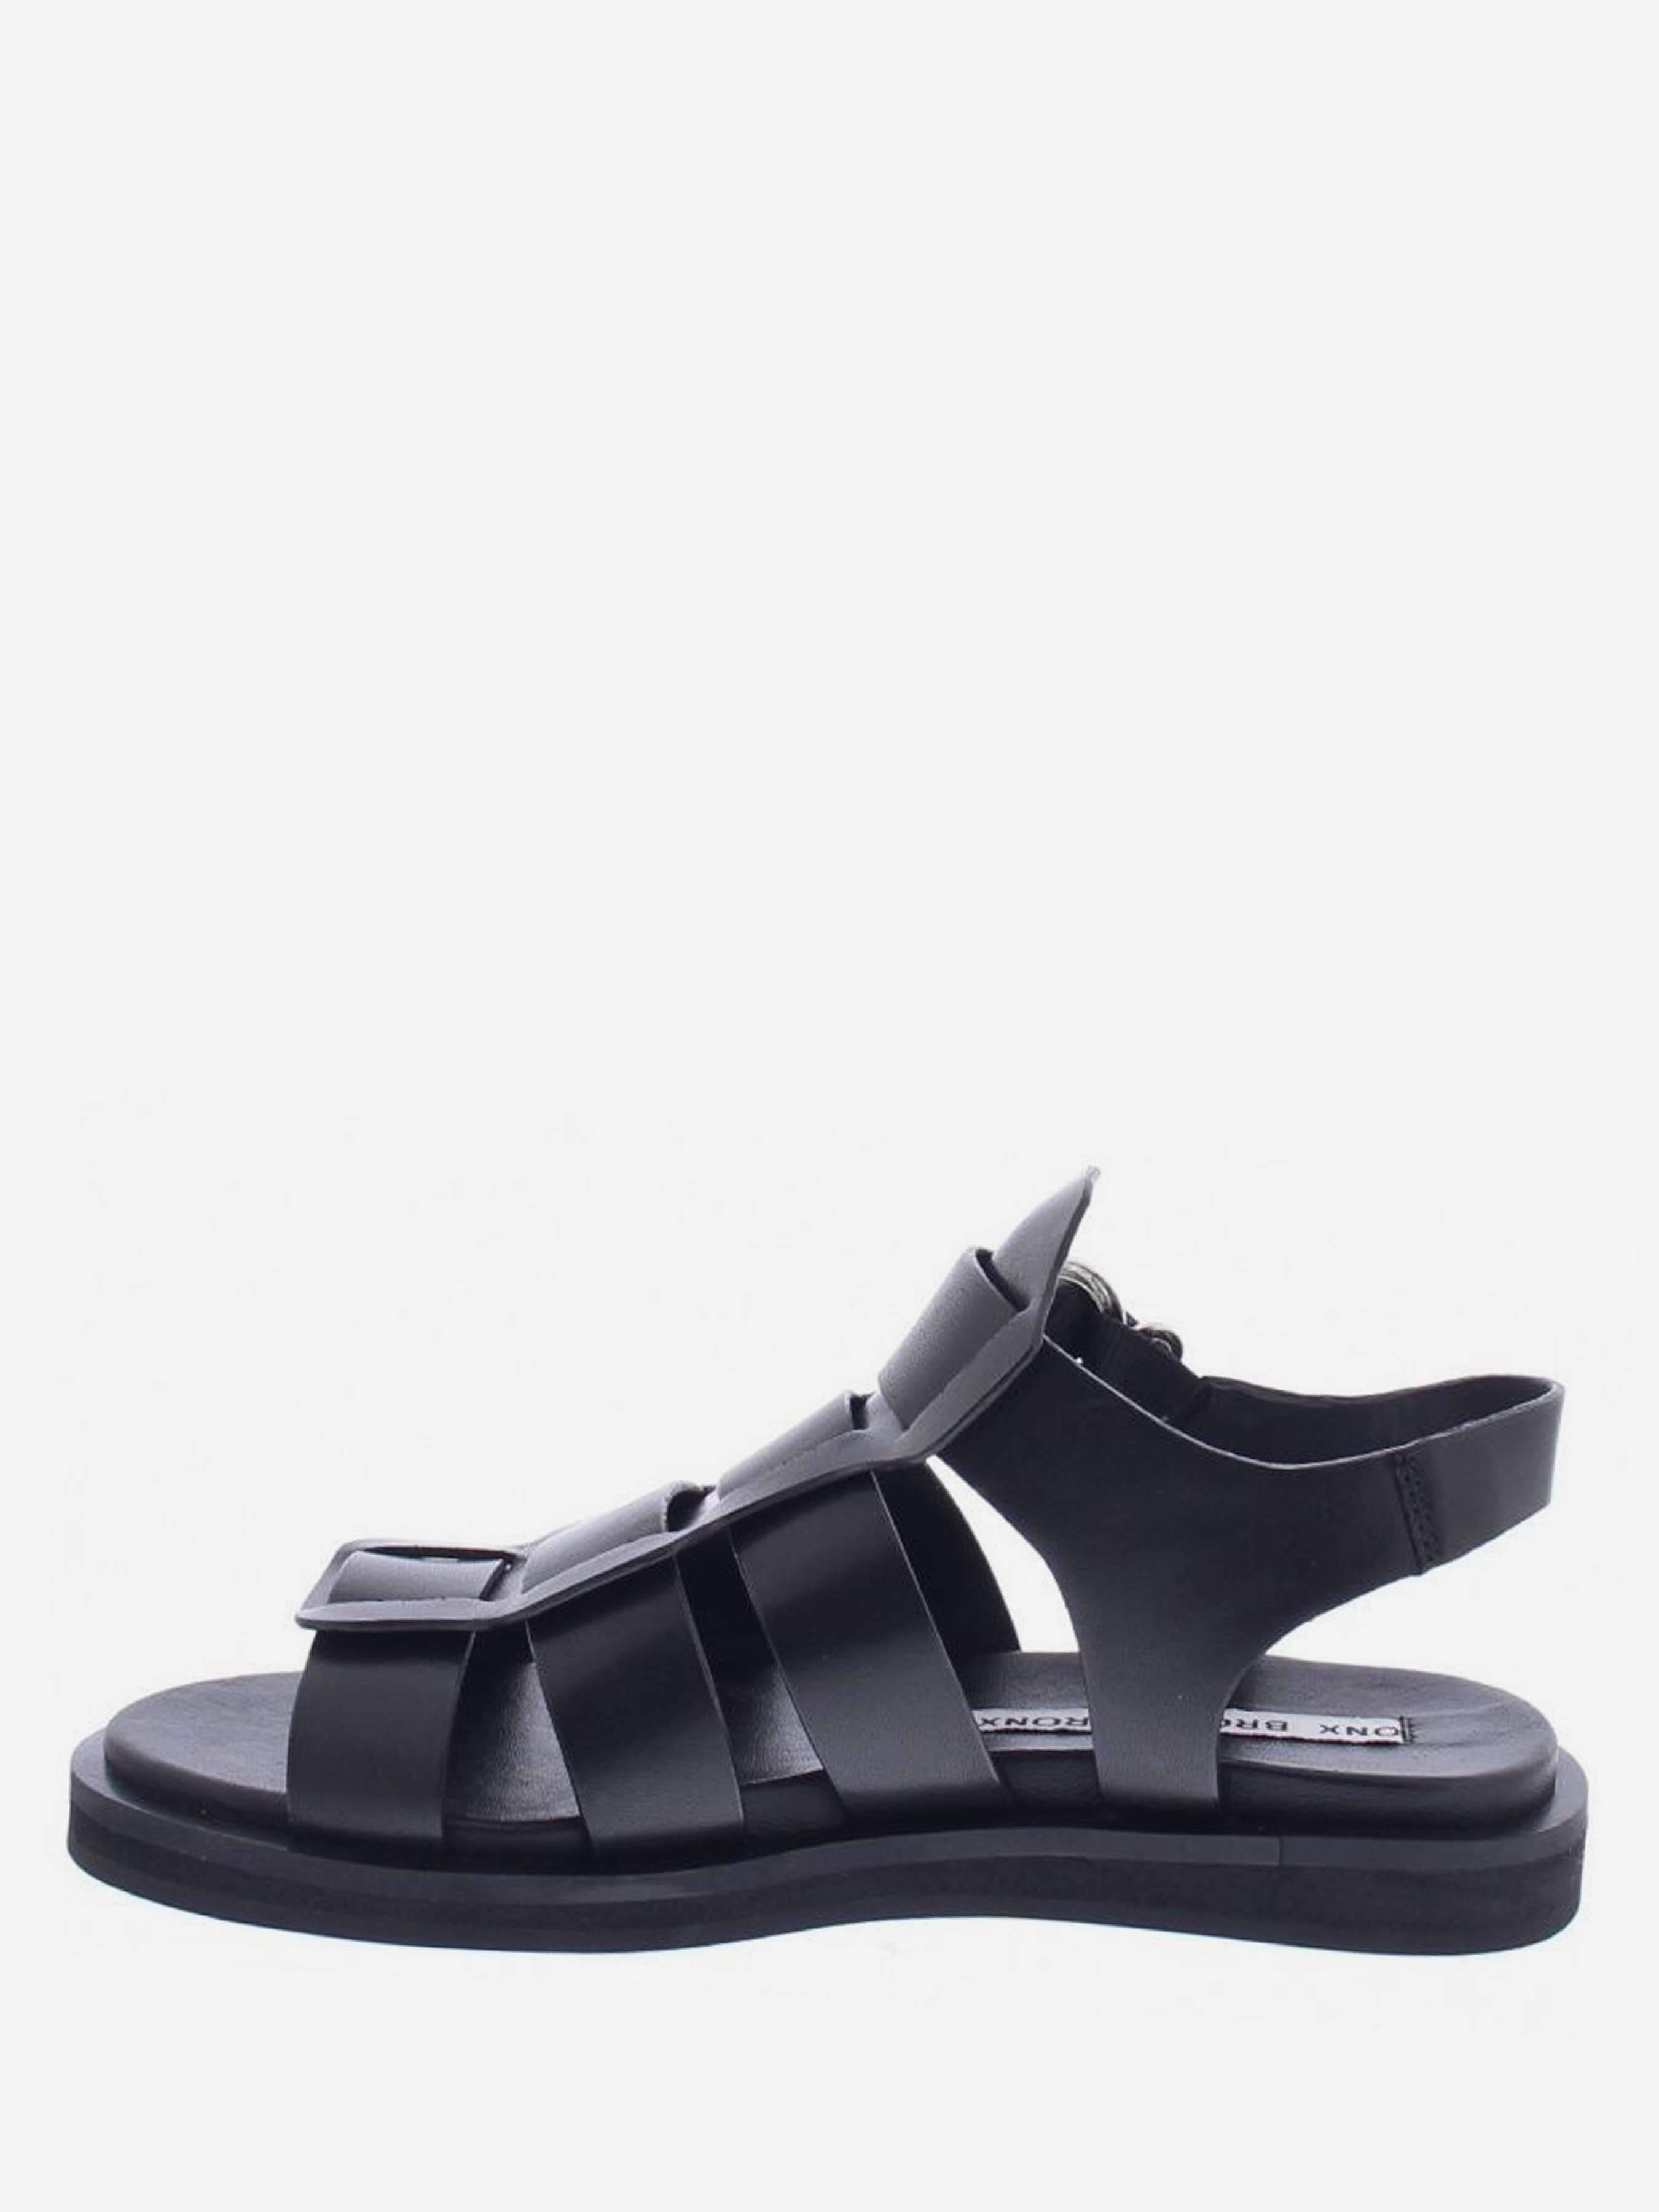 Сандалии для женщин Bronx BbalaX BX2051 купить обувь, 2017